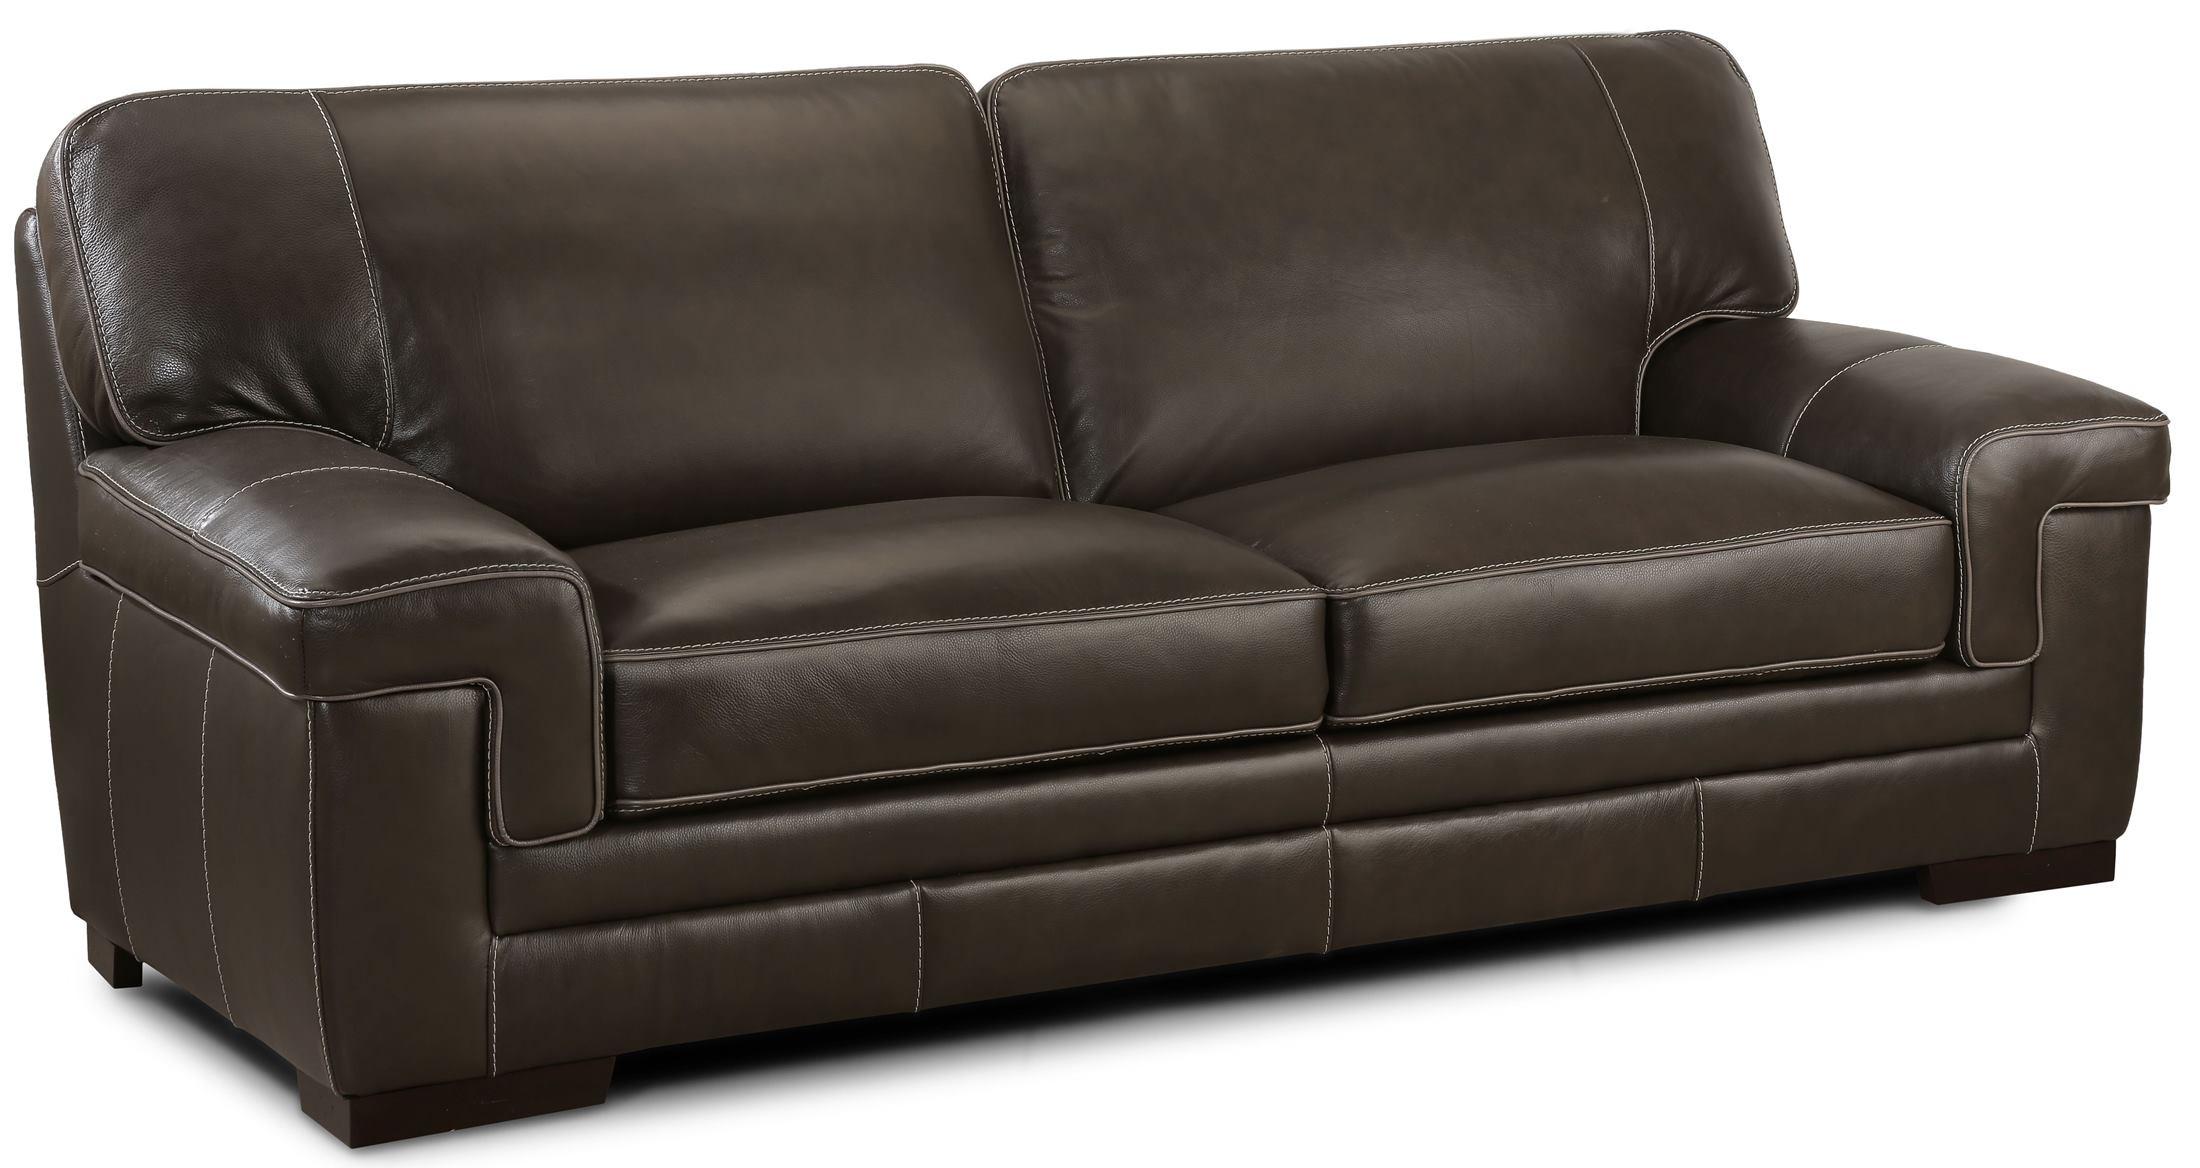 Macco Longhorn Ghost Sofa From Simon Li J310 3s Lw Aa0g